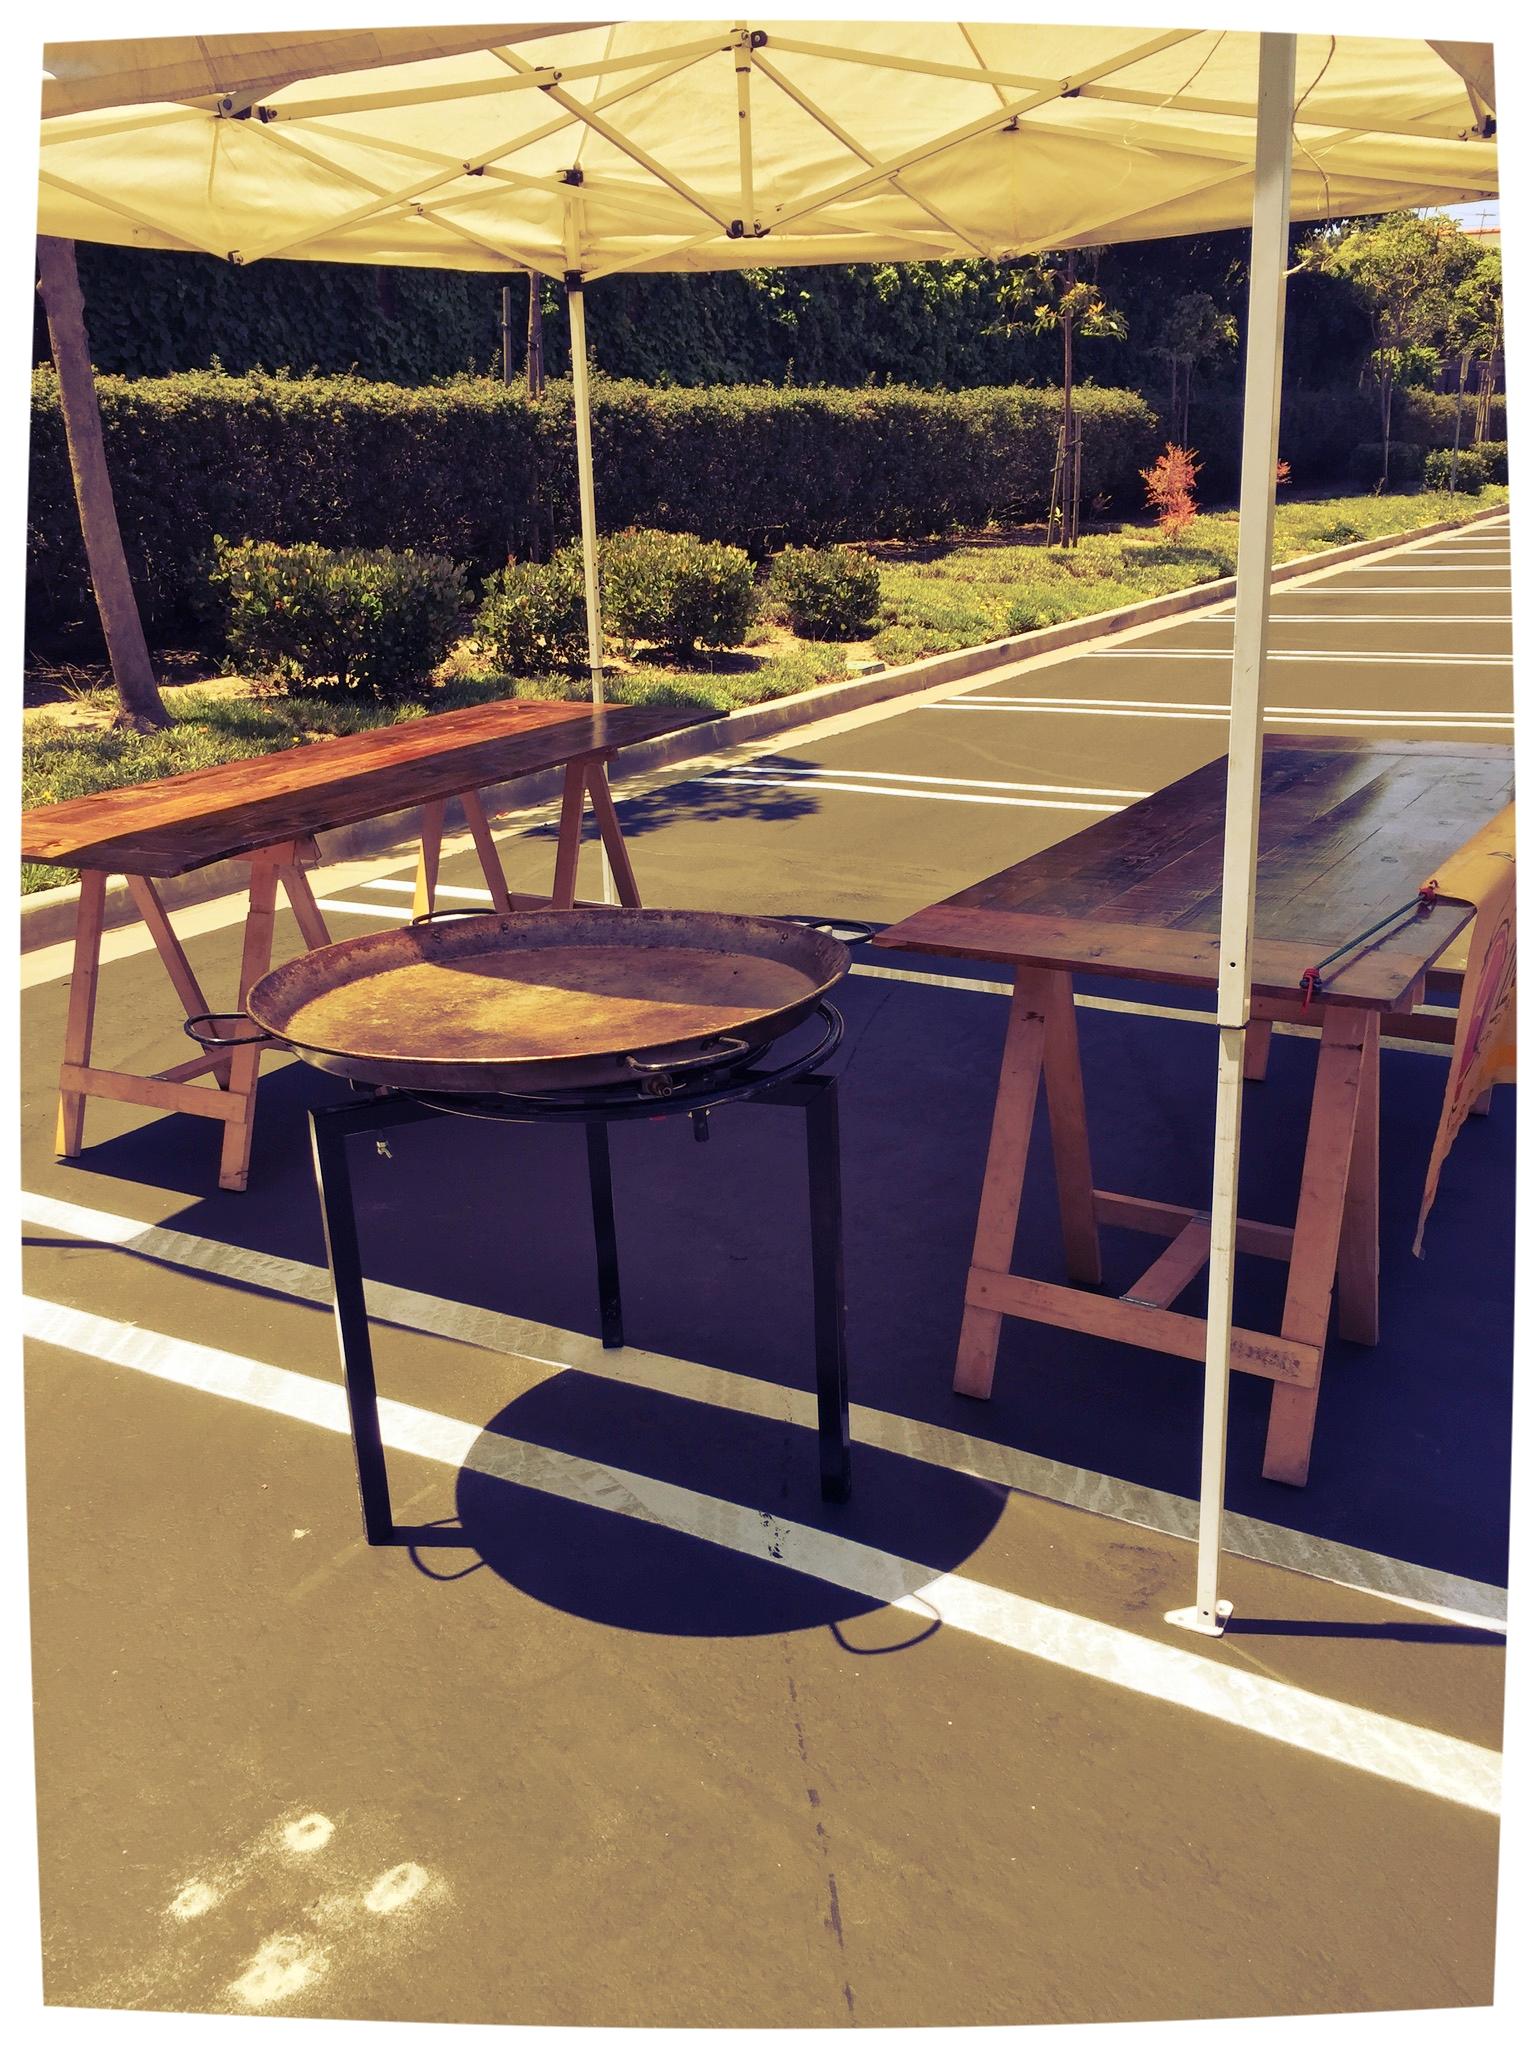 bomba-paella-catering -layout-2.jpg